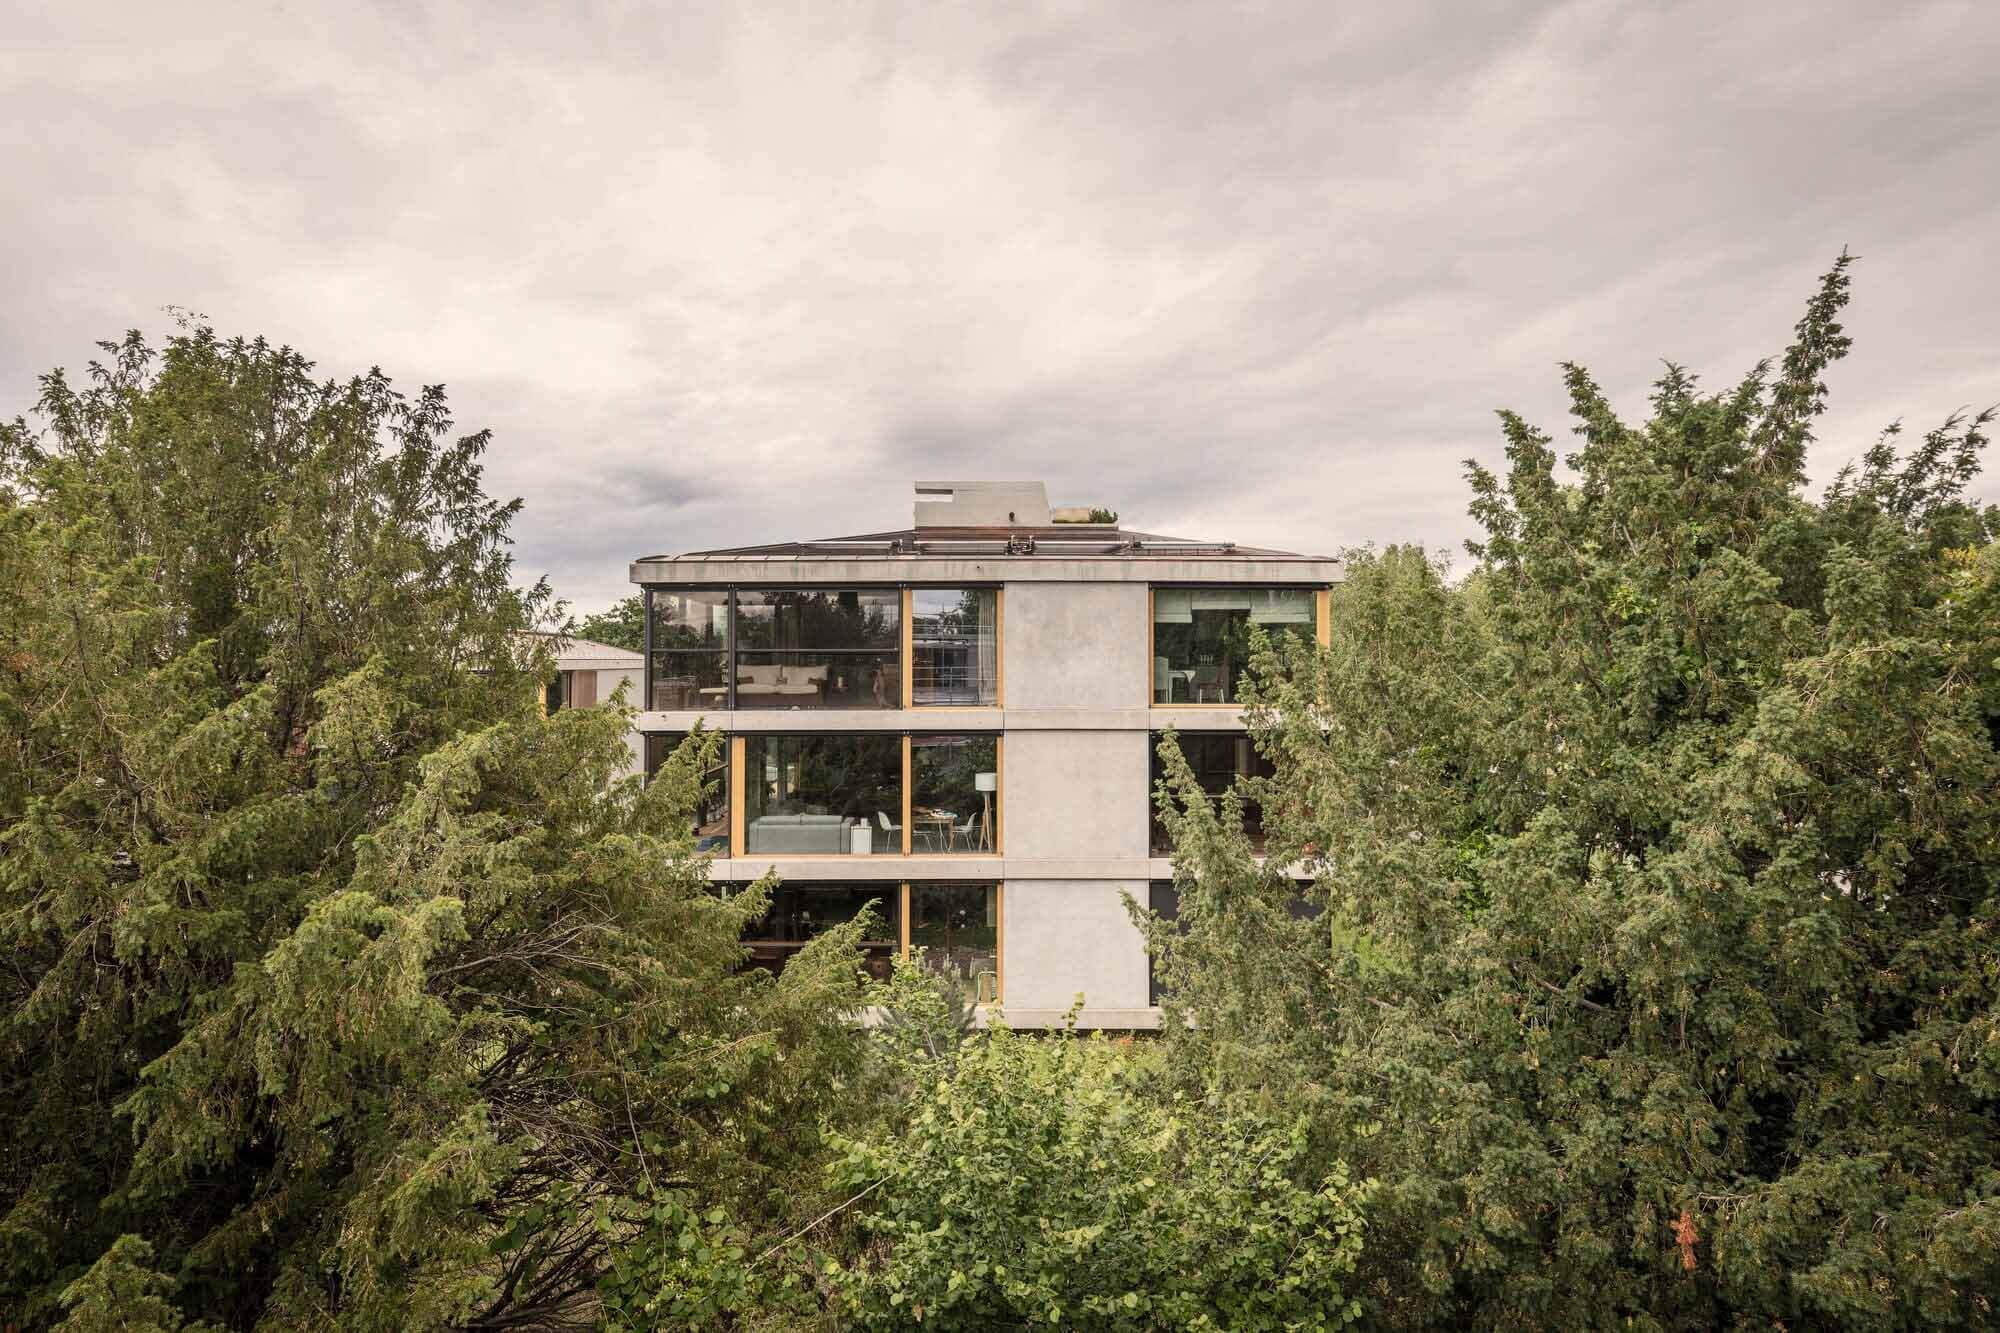 HMC_P198 / 19 Апартаменты / Philippe Meyer Architecte